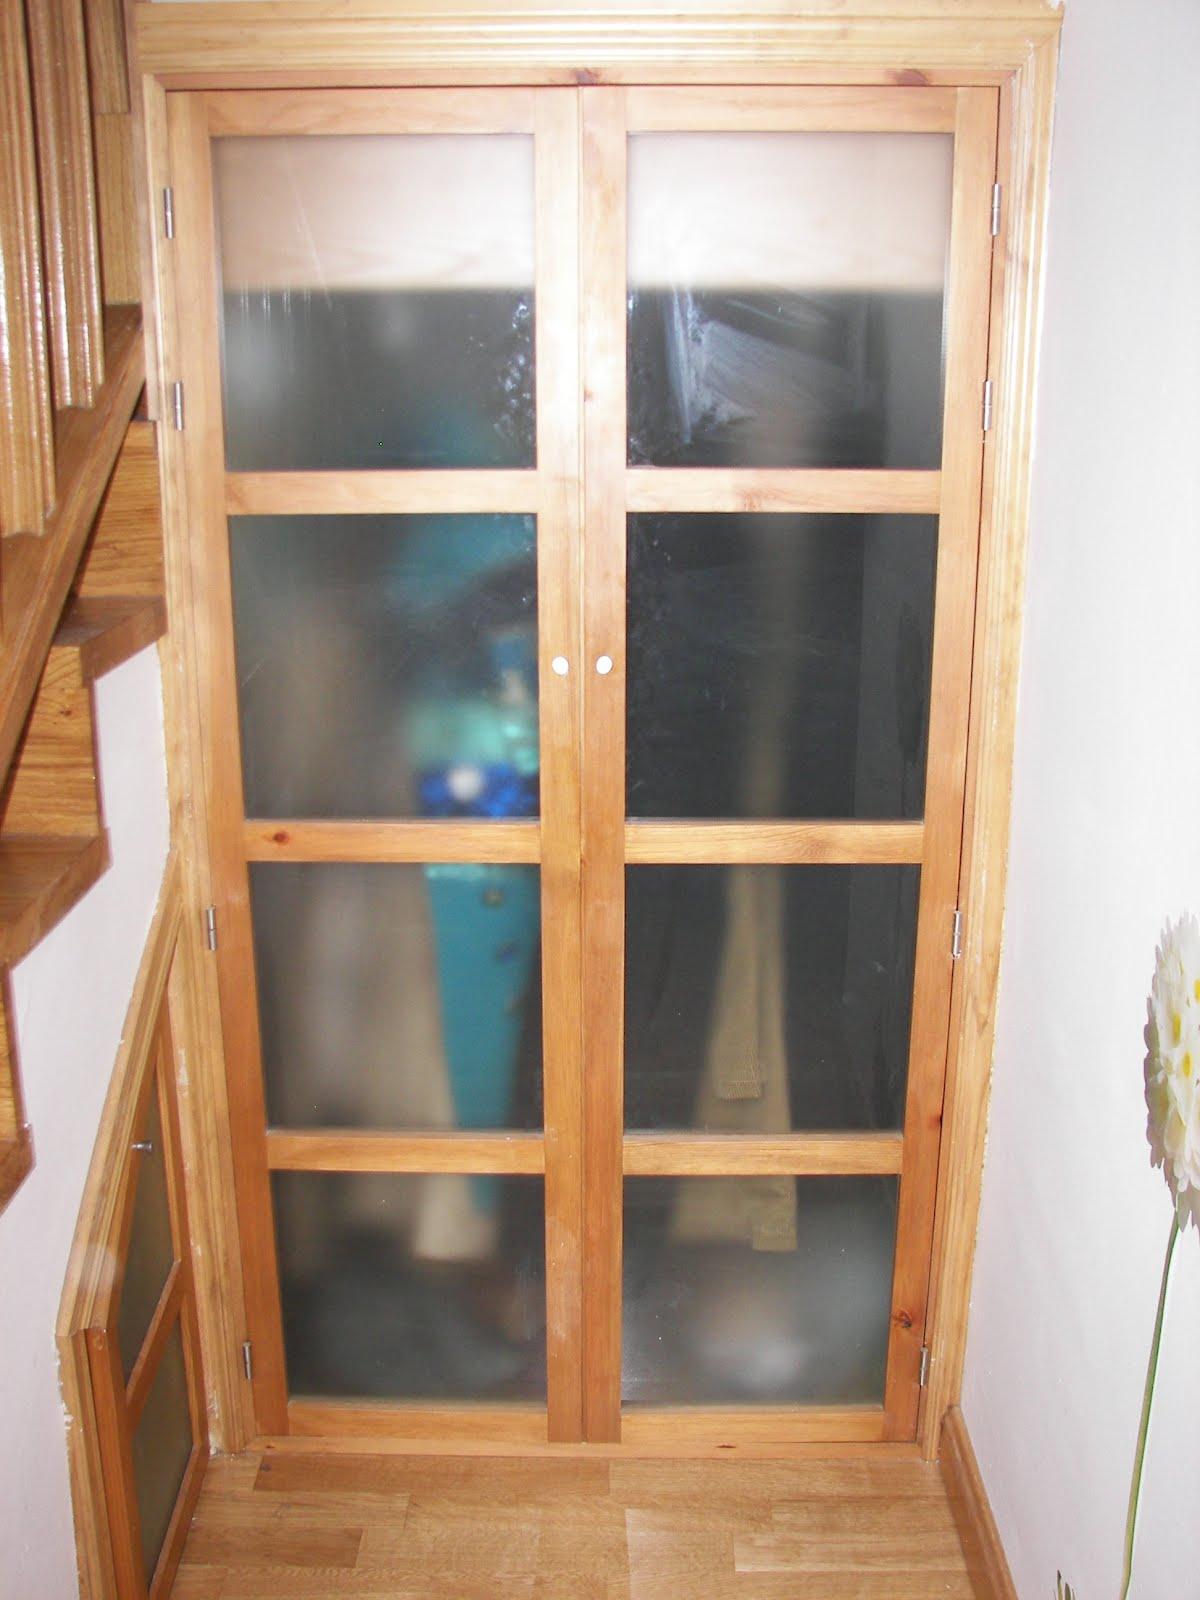 Carpinteria viosca roda armario bajo escalera - Armario bajo escalera ...